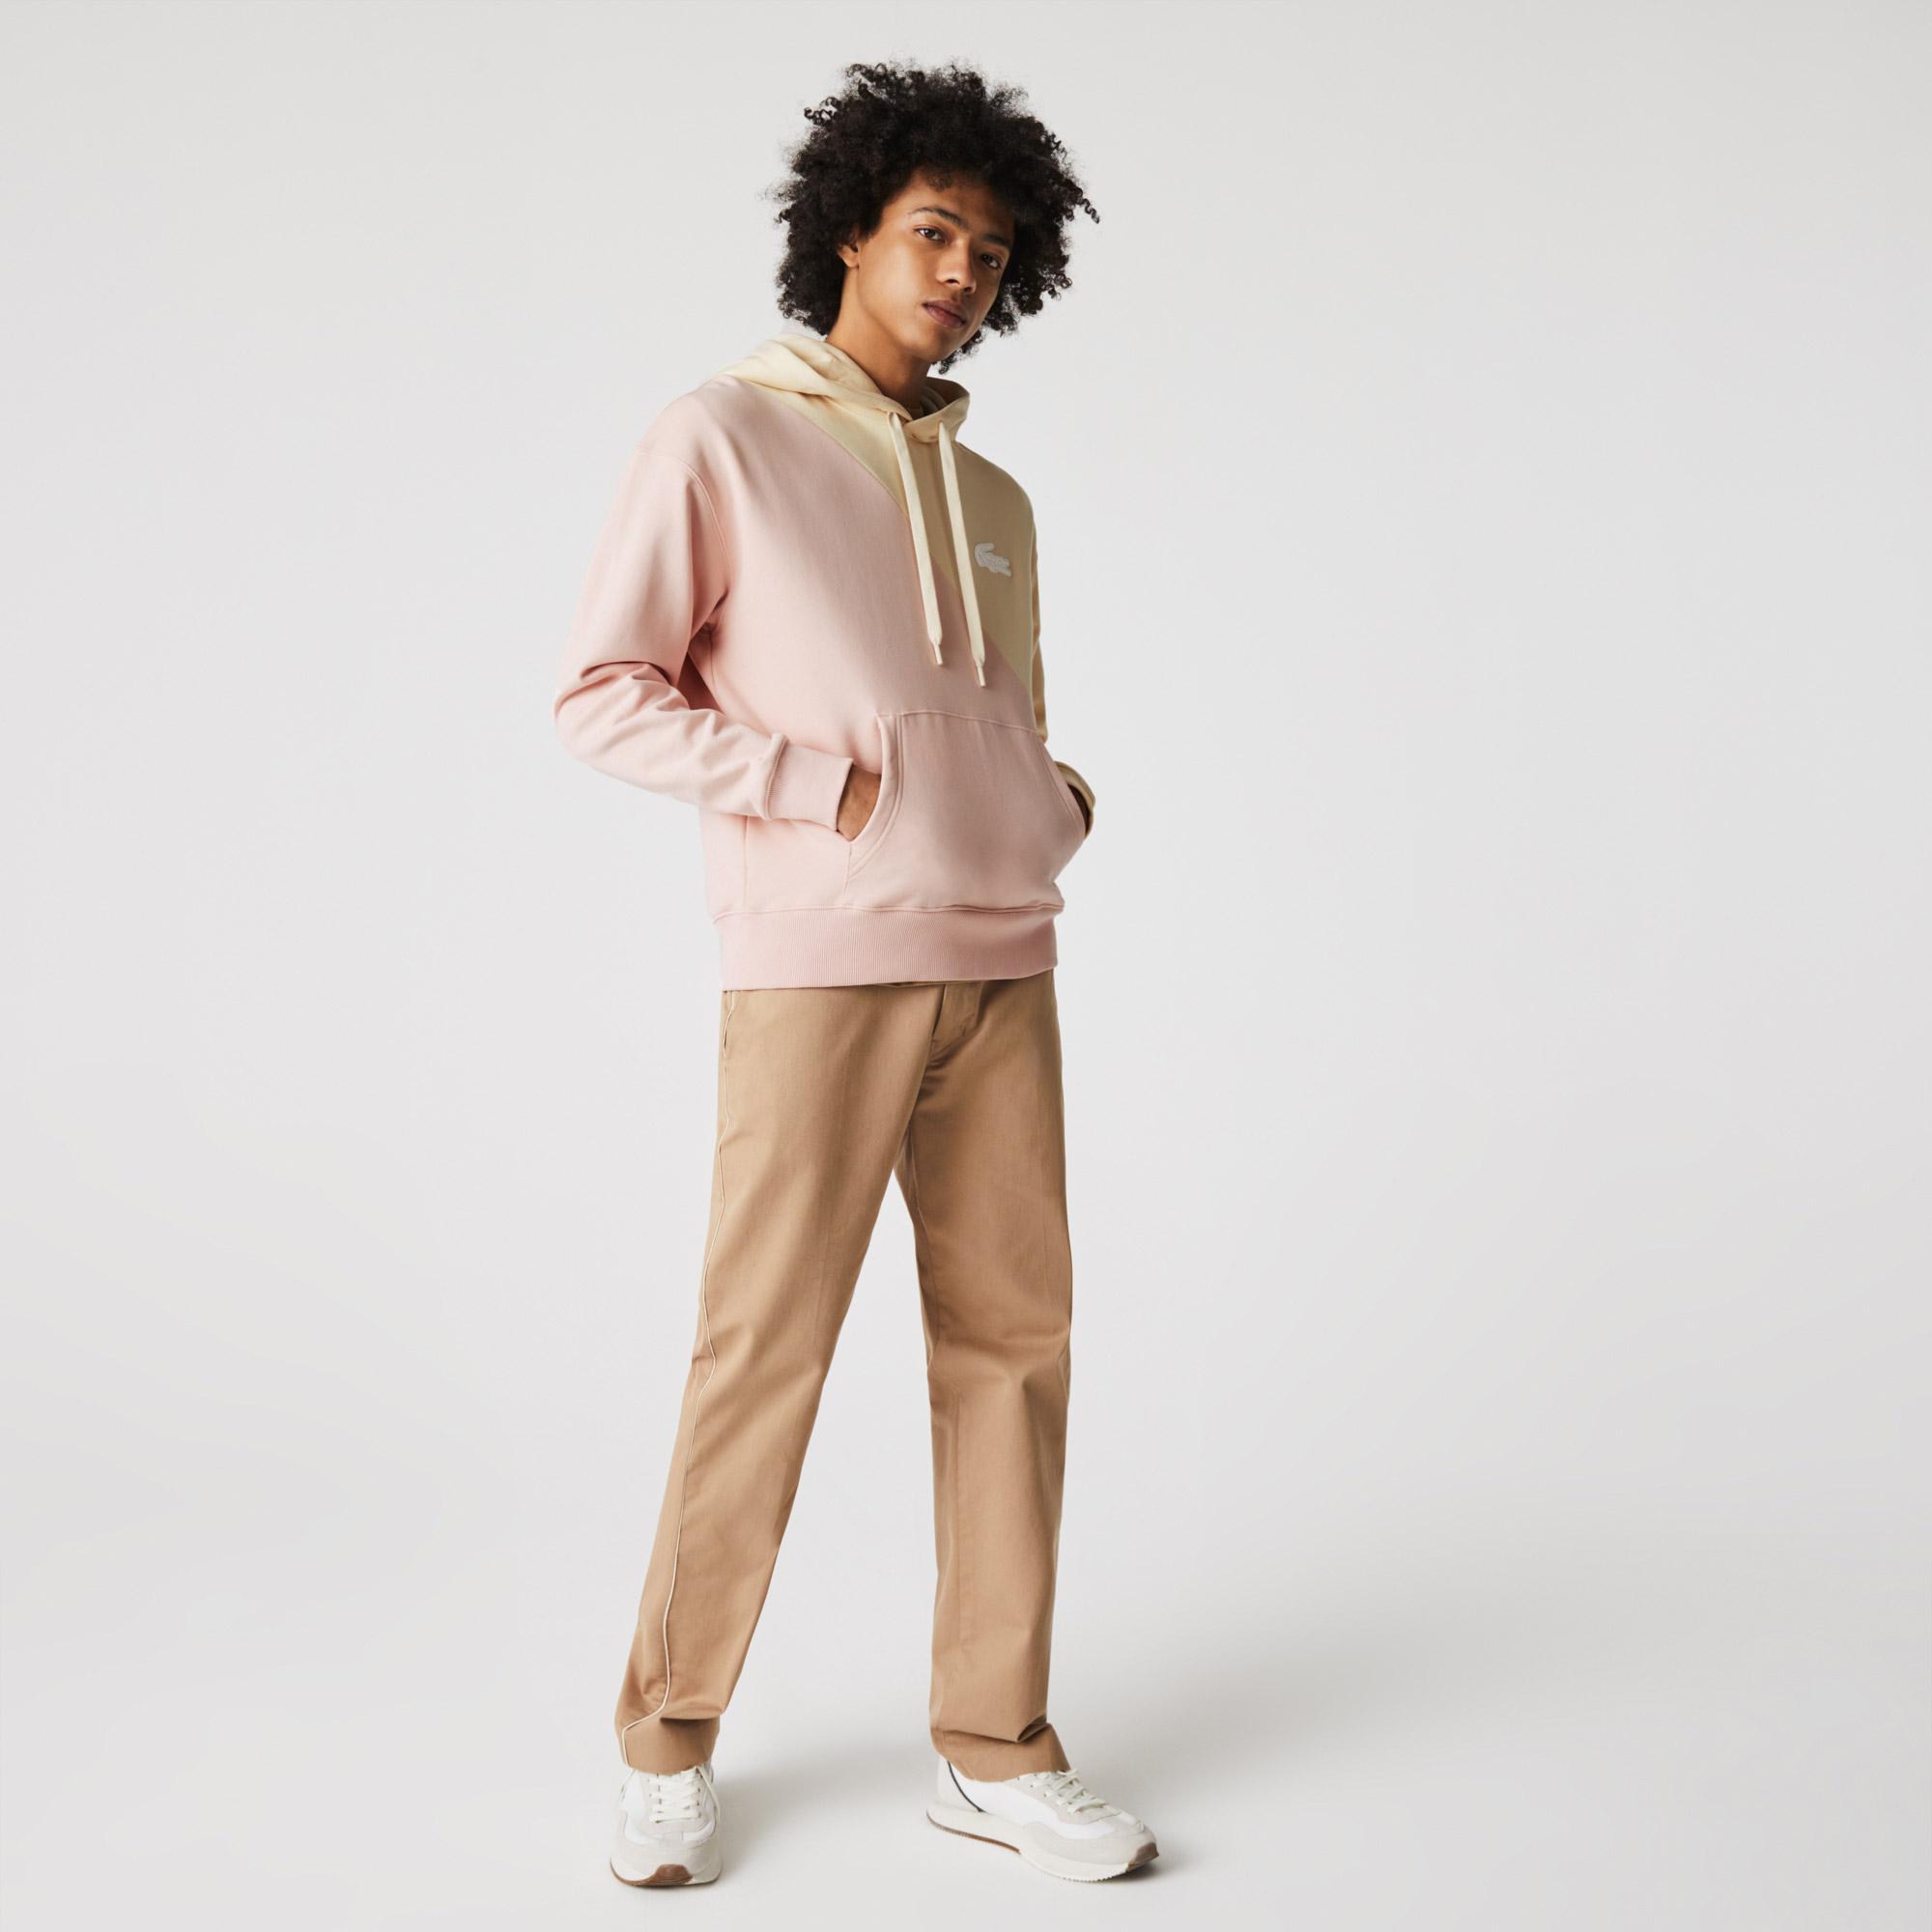 Lacoste L!ve Unisex Loose Fit Kapüşonlu Renk Bloklu Bej - Pembe Sweatshirt